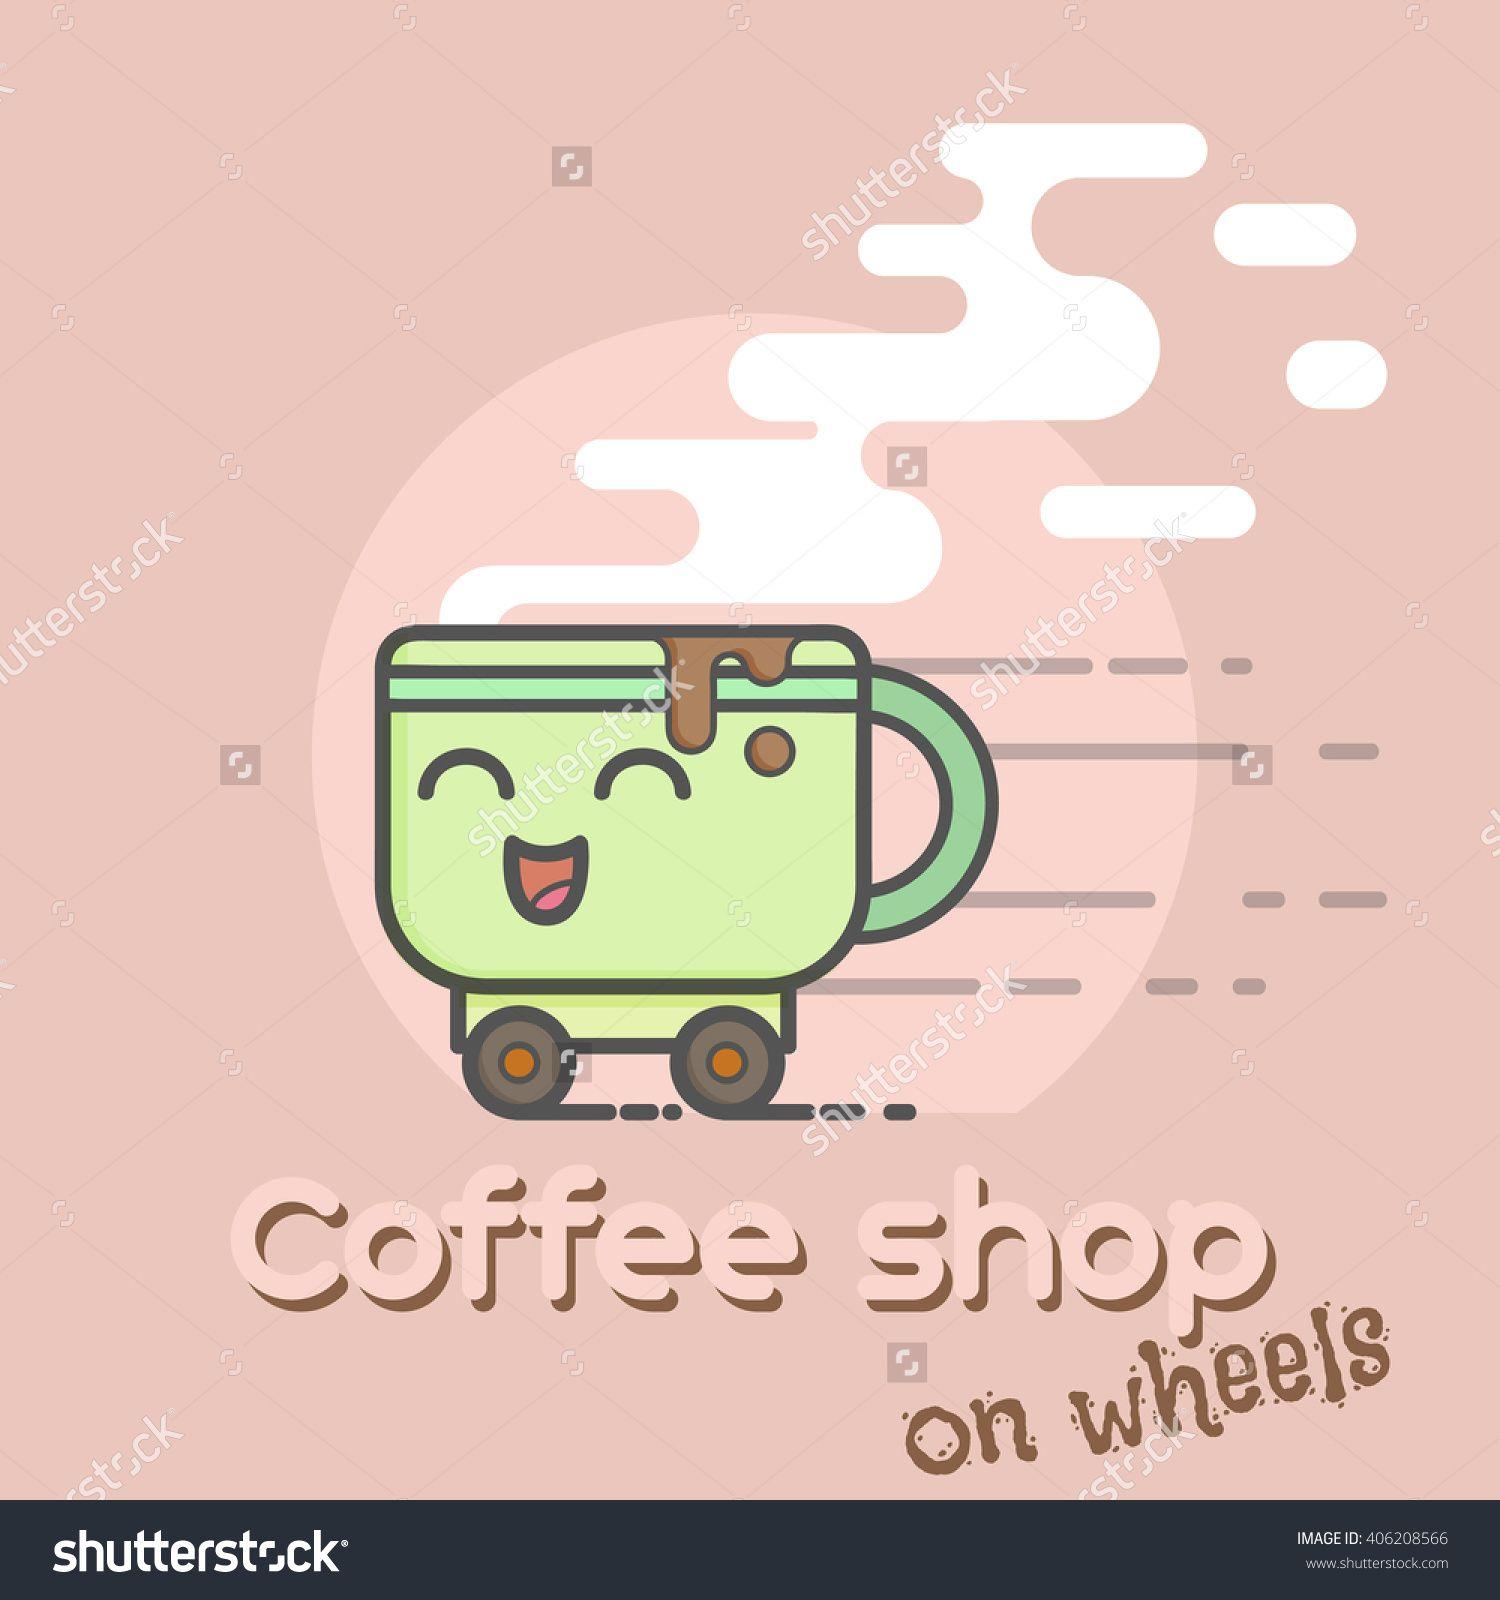 Coffee Cup Clip Art Coffee cup art, Coffee cartoon